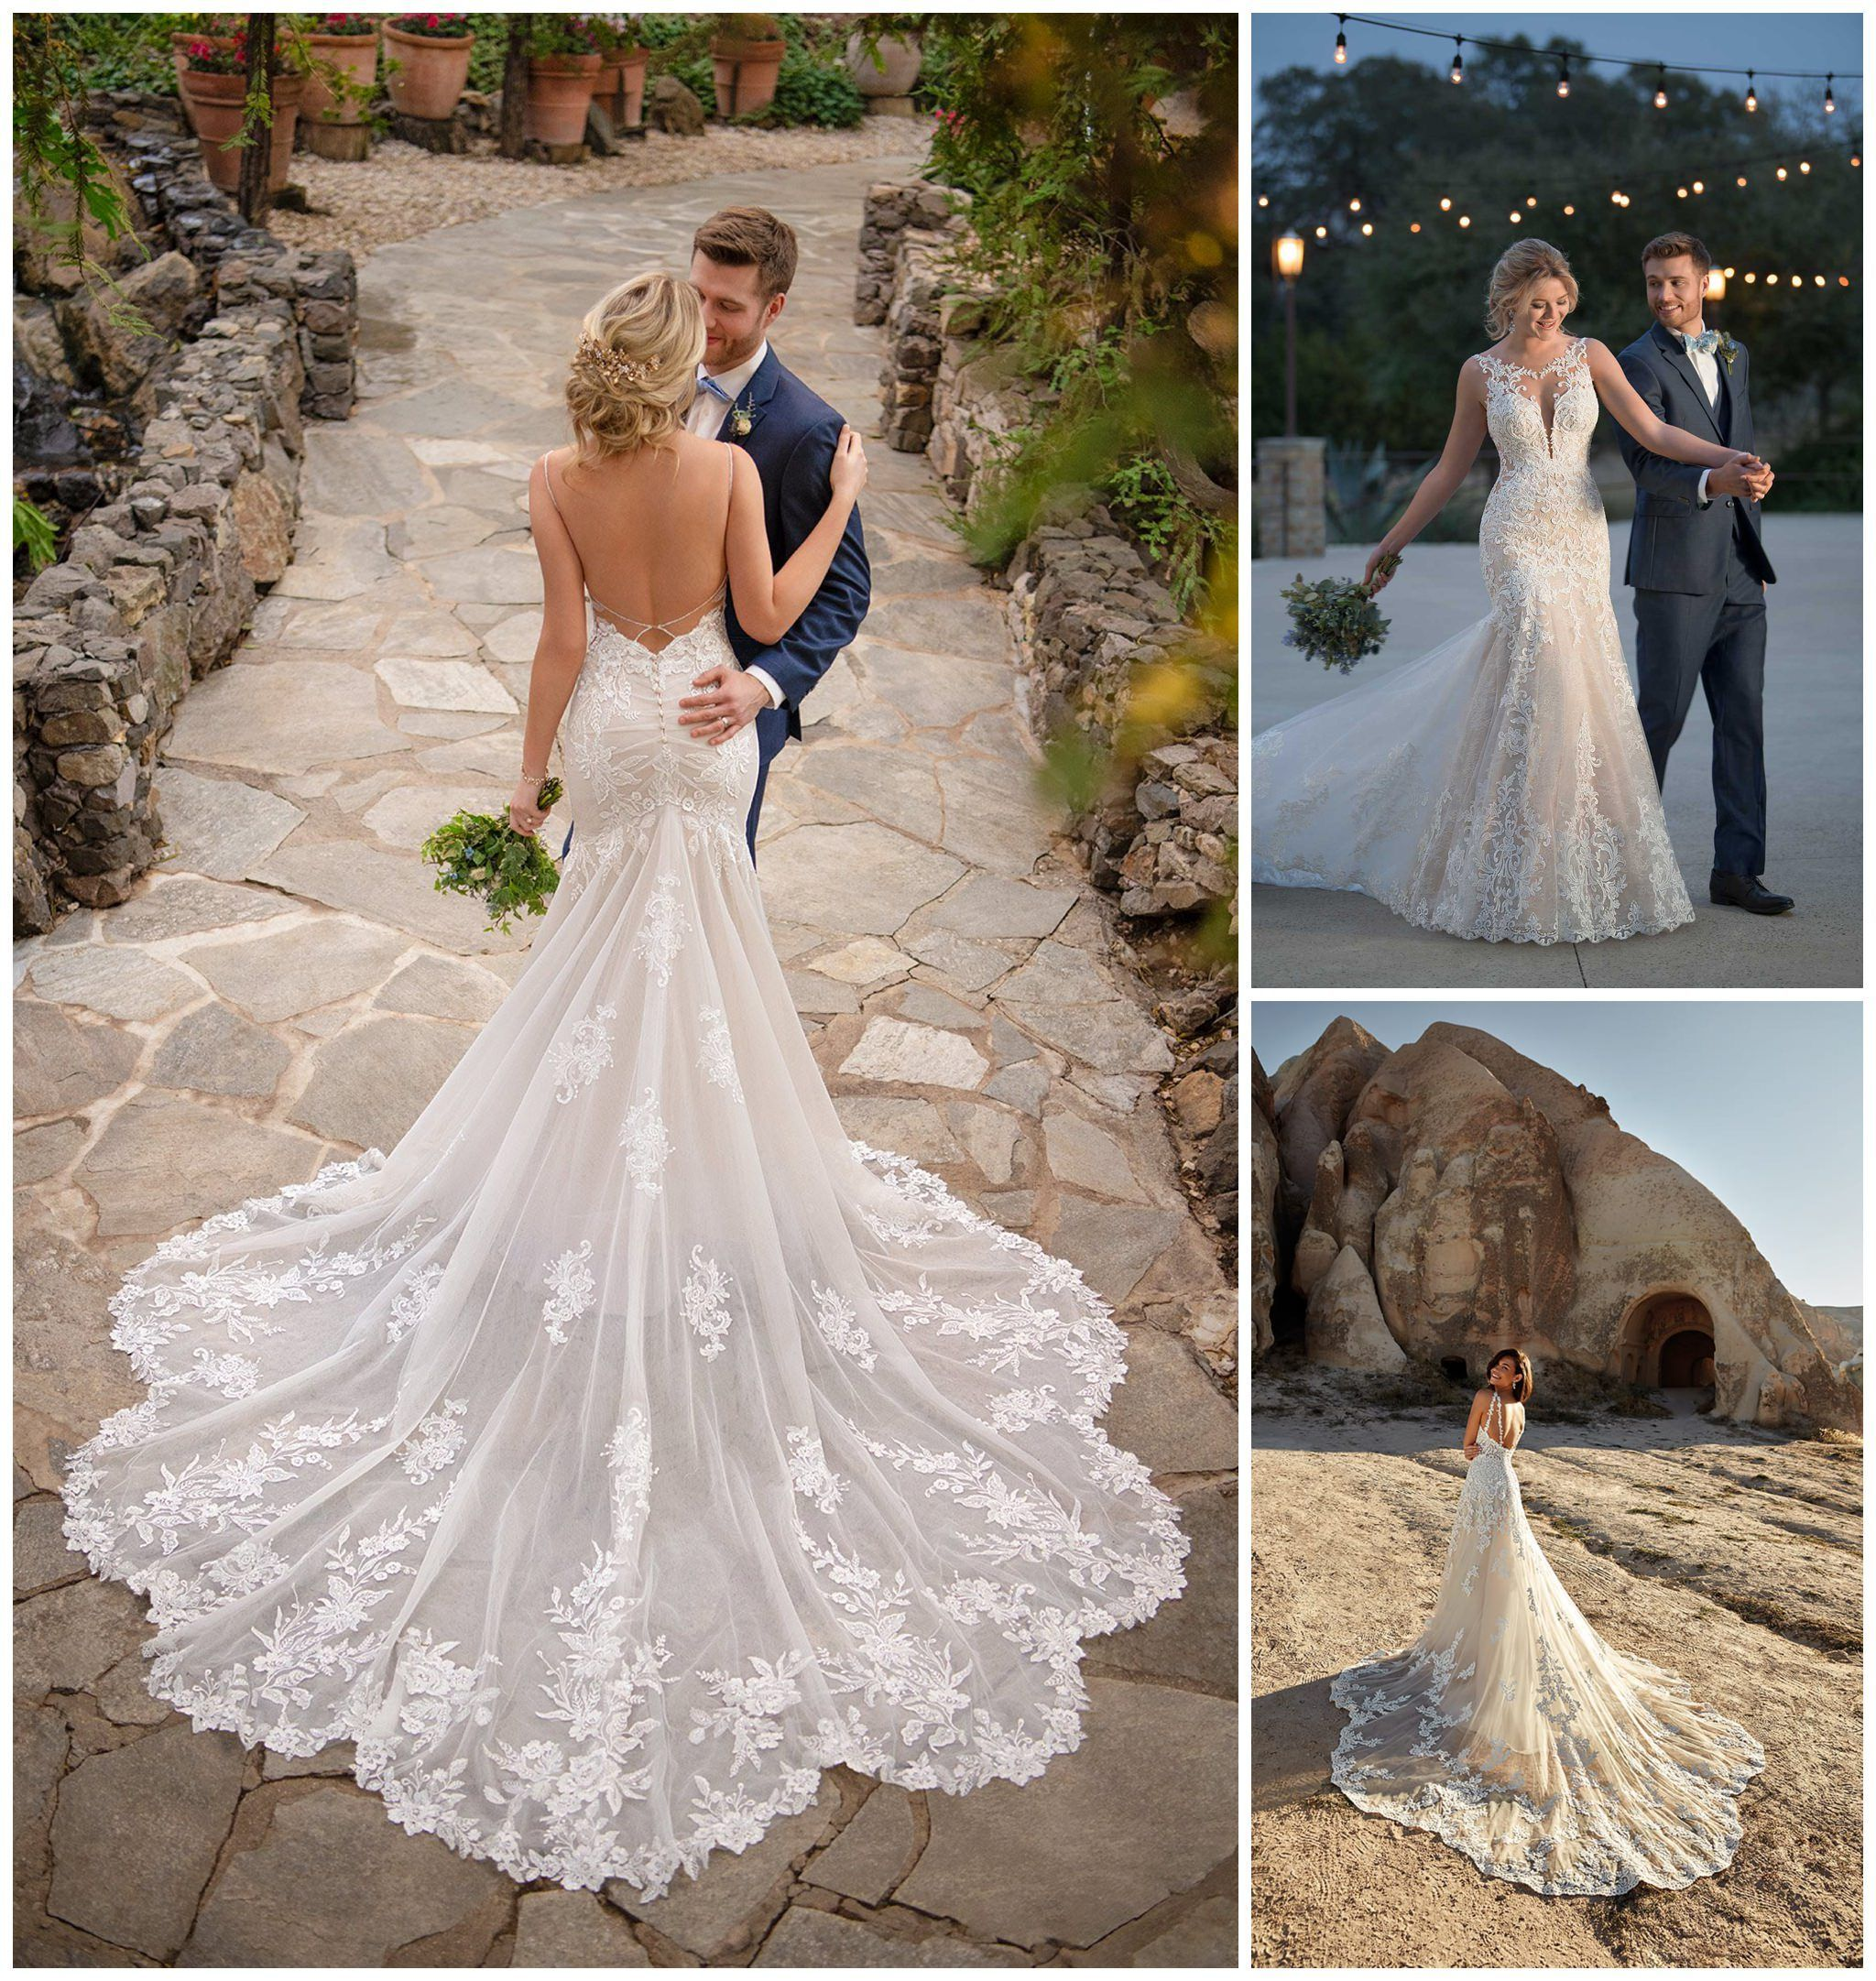 The 20 Best Wedding Dress Stores in Montreal   Best wedding dresses ...